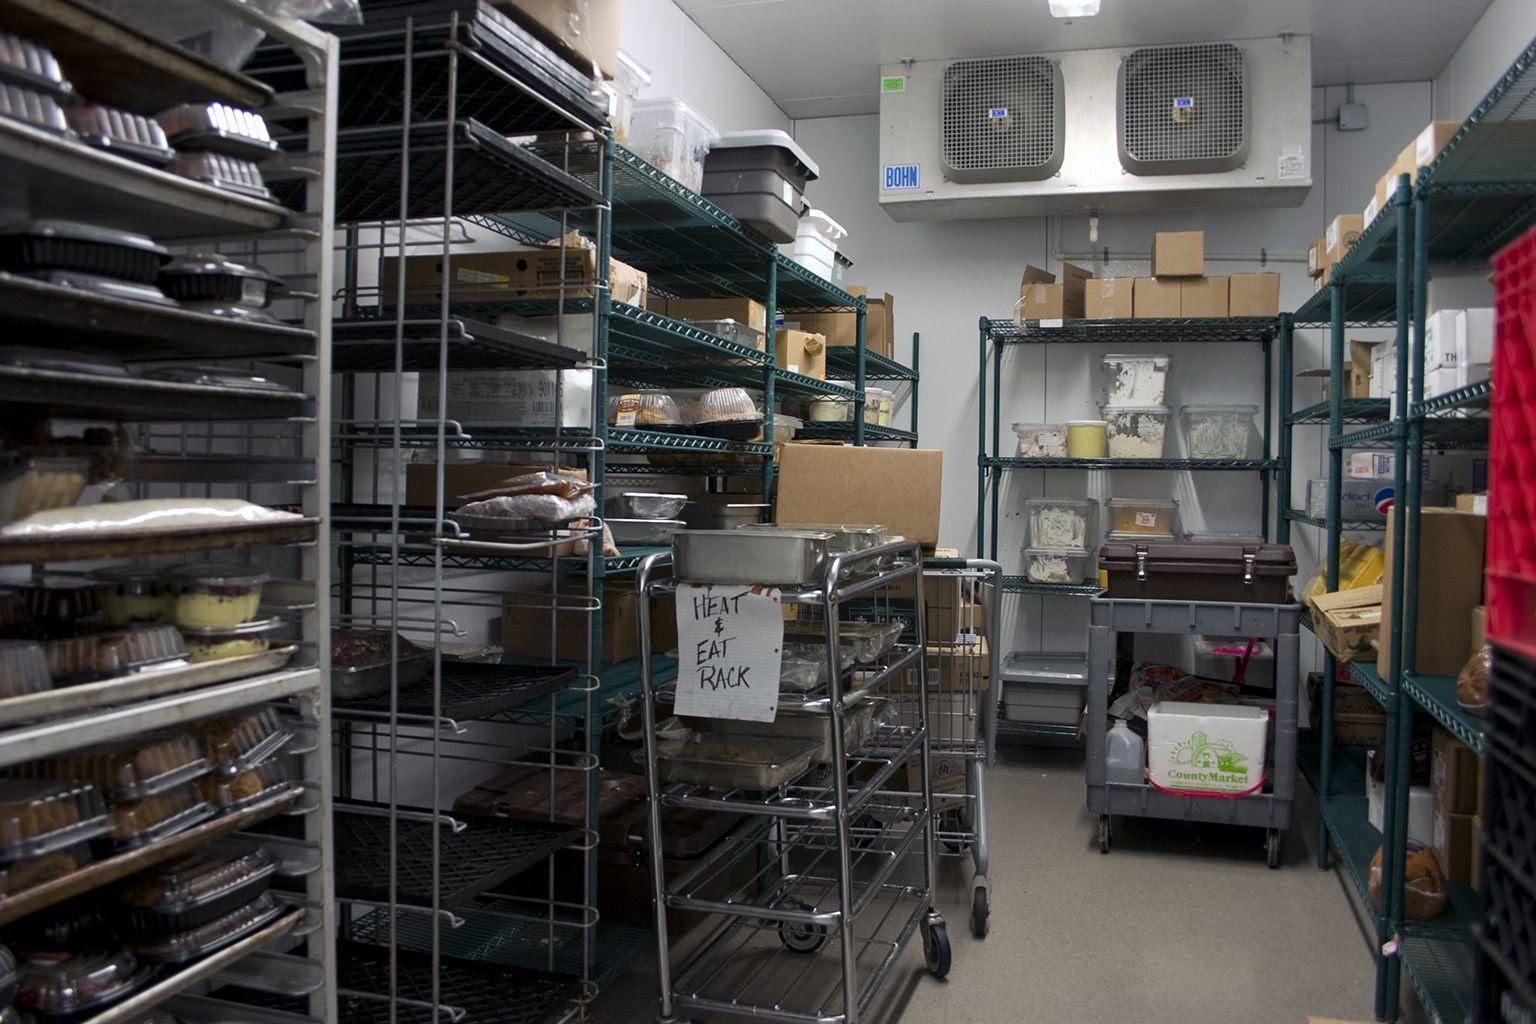 Bakery Refrigerated Storerooms Walk In Freezer Baking Set Play Houses